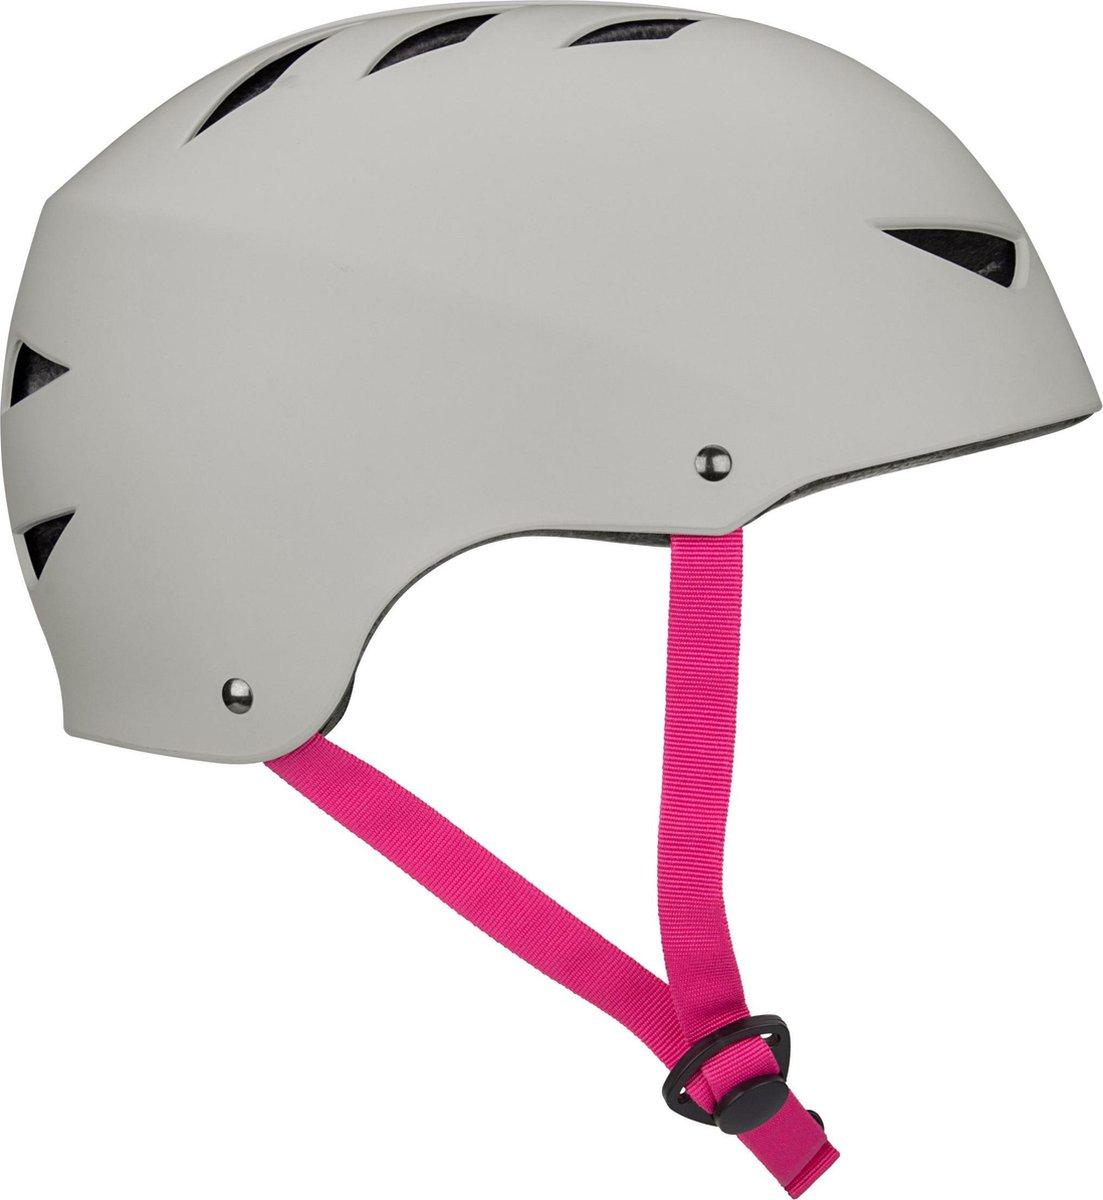 Nijdam Skate Helm - Pinky Swear - Grijs/Fuchsia - M